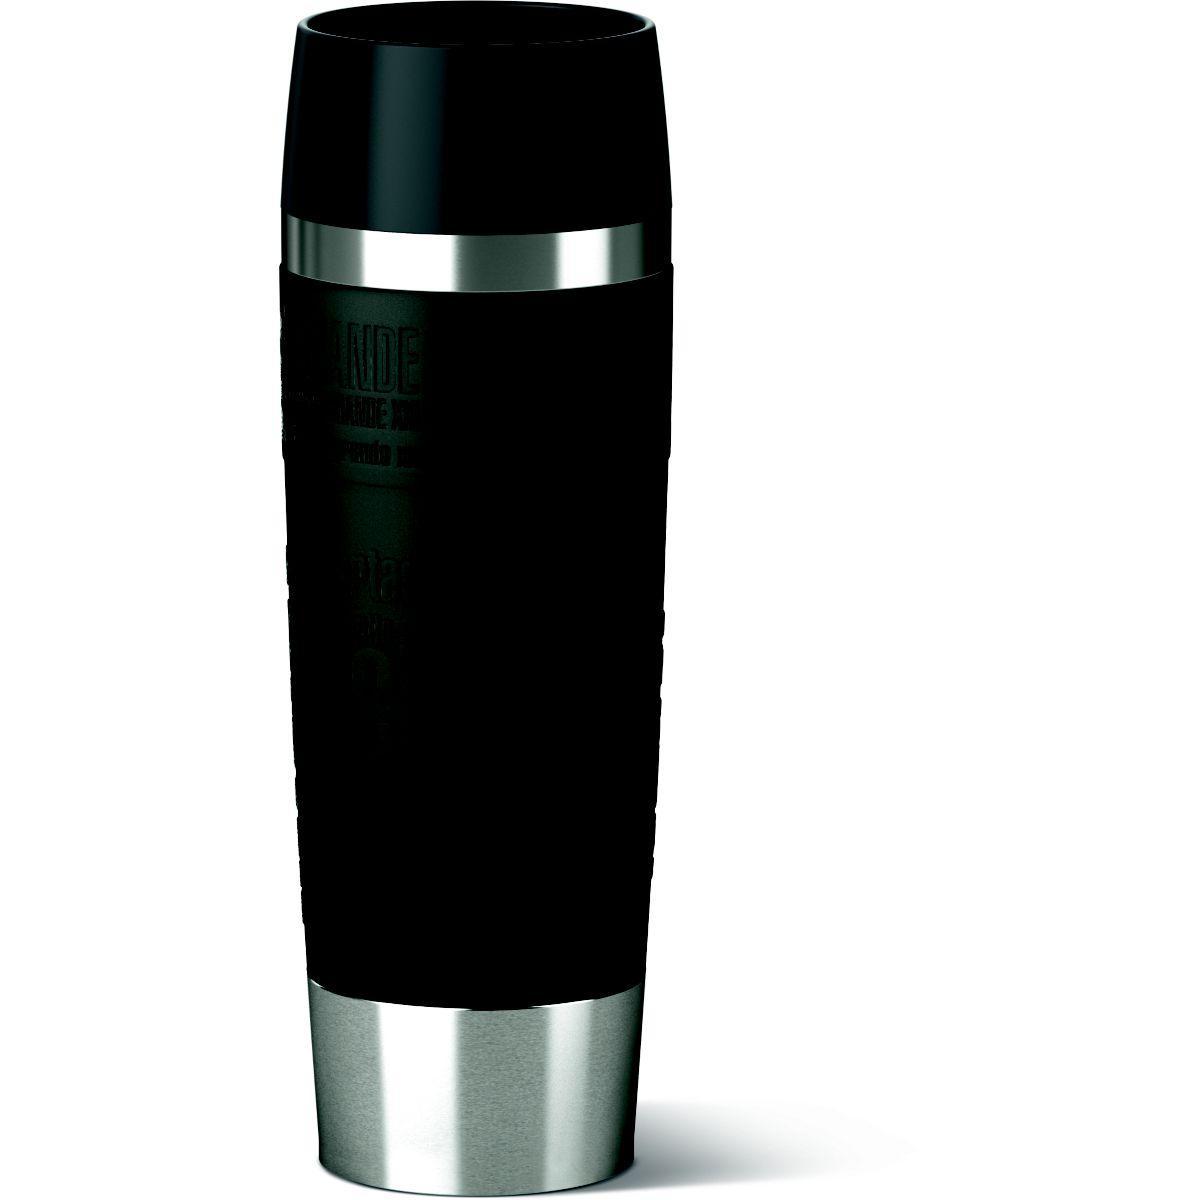 Mug isotherme emsa isotherme 0.5l inox/noir - livraison offerte : code liv (photo)